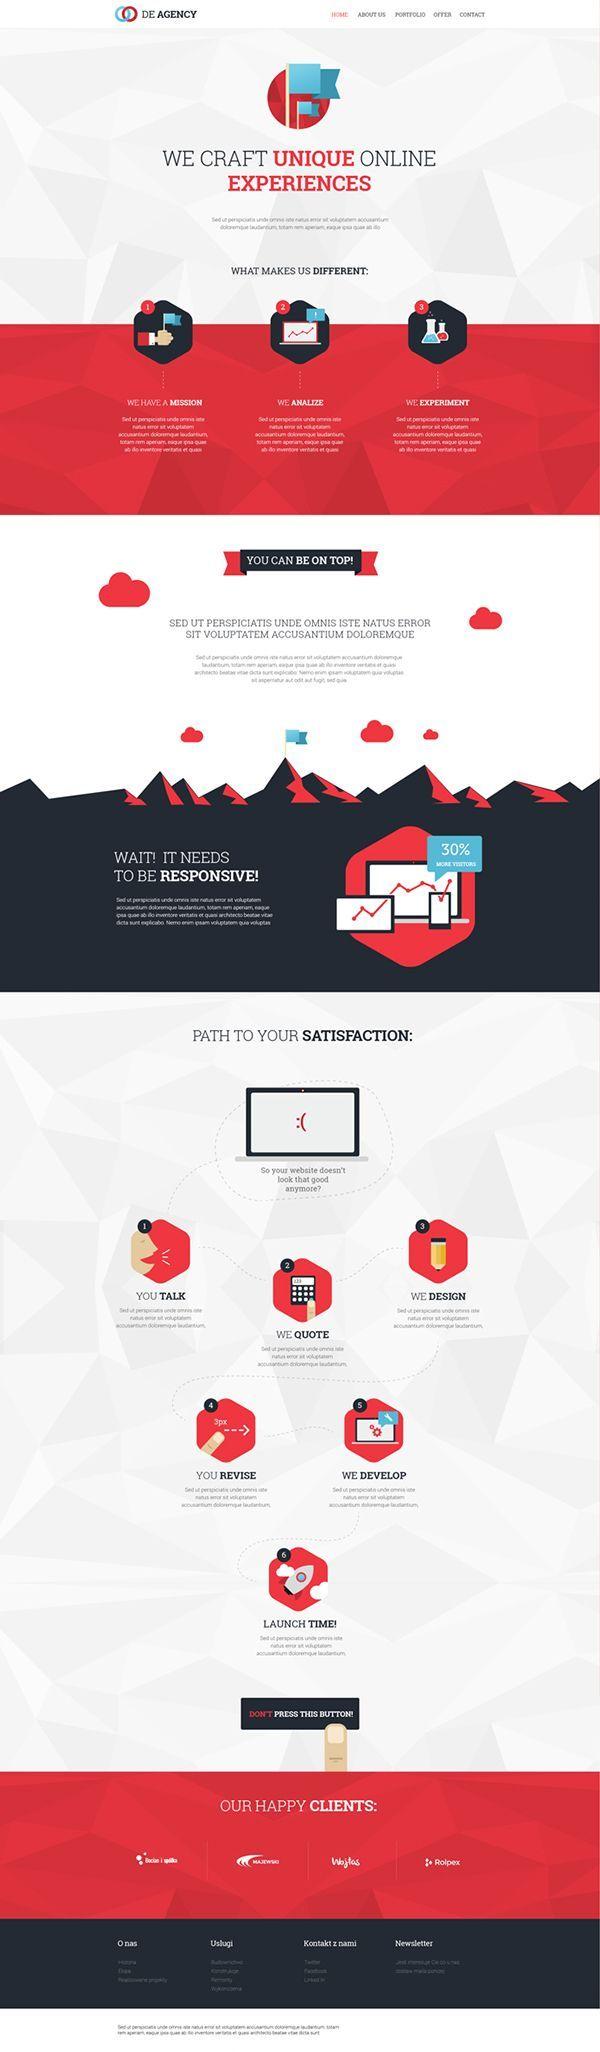 De Agency - Flat UI design concept by Kuba Zelichowski, via Behance